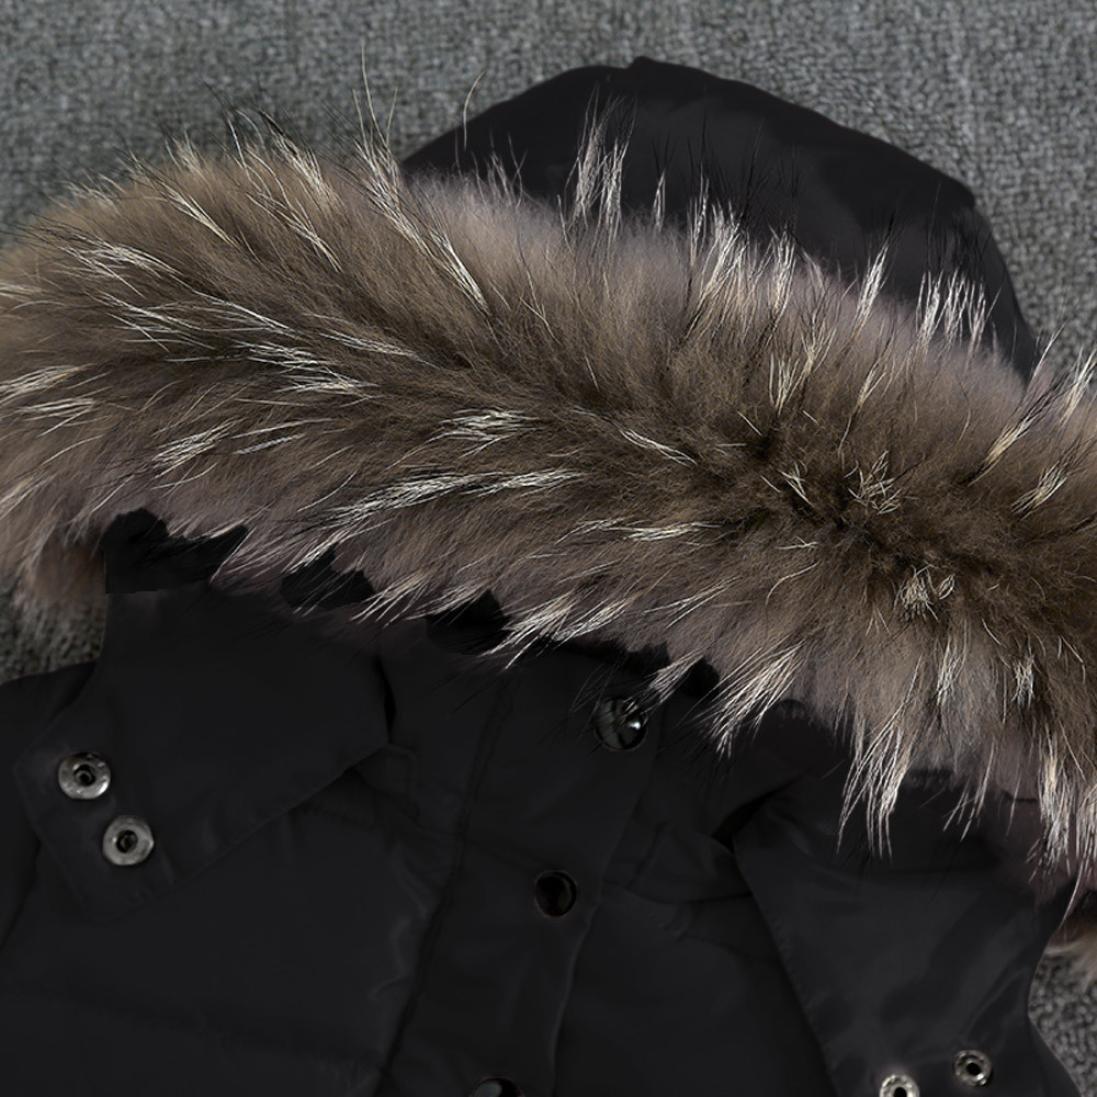 11e0c5e62 Amazon.com  Fullfun 1-3T Toddler Baby Winter Warm Coat Outerwear ...